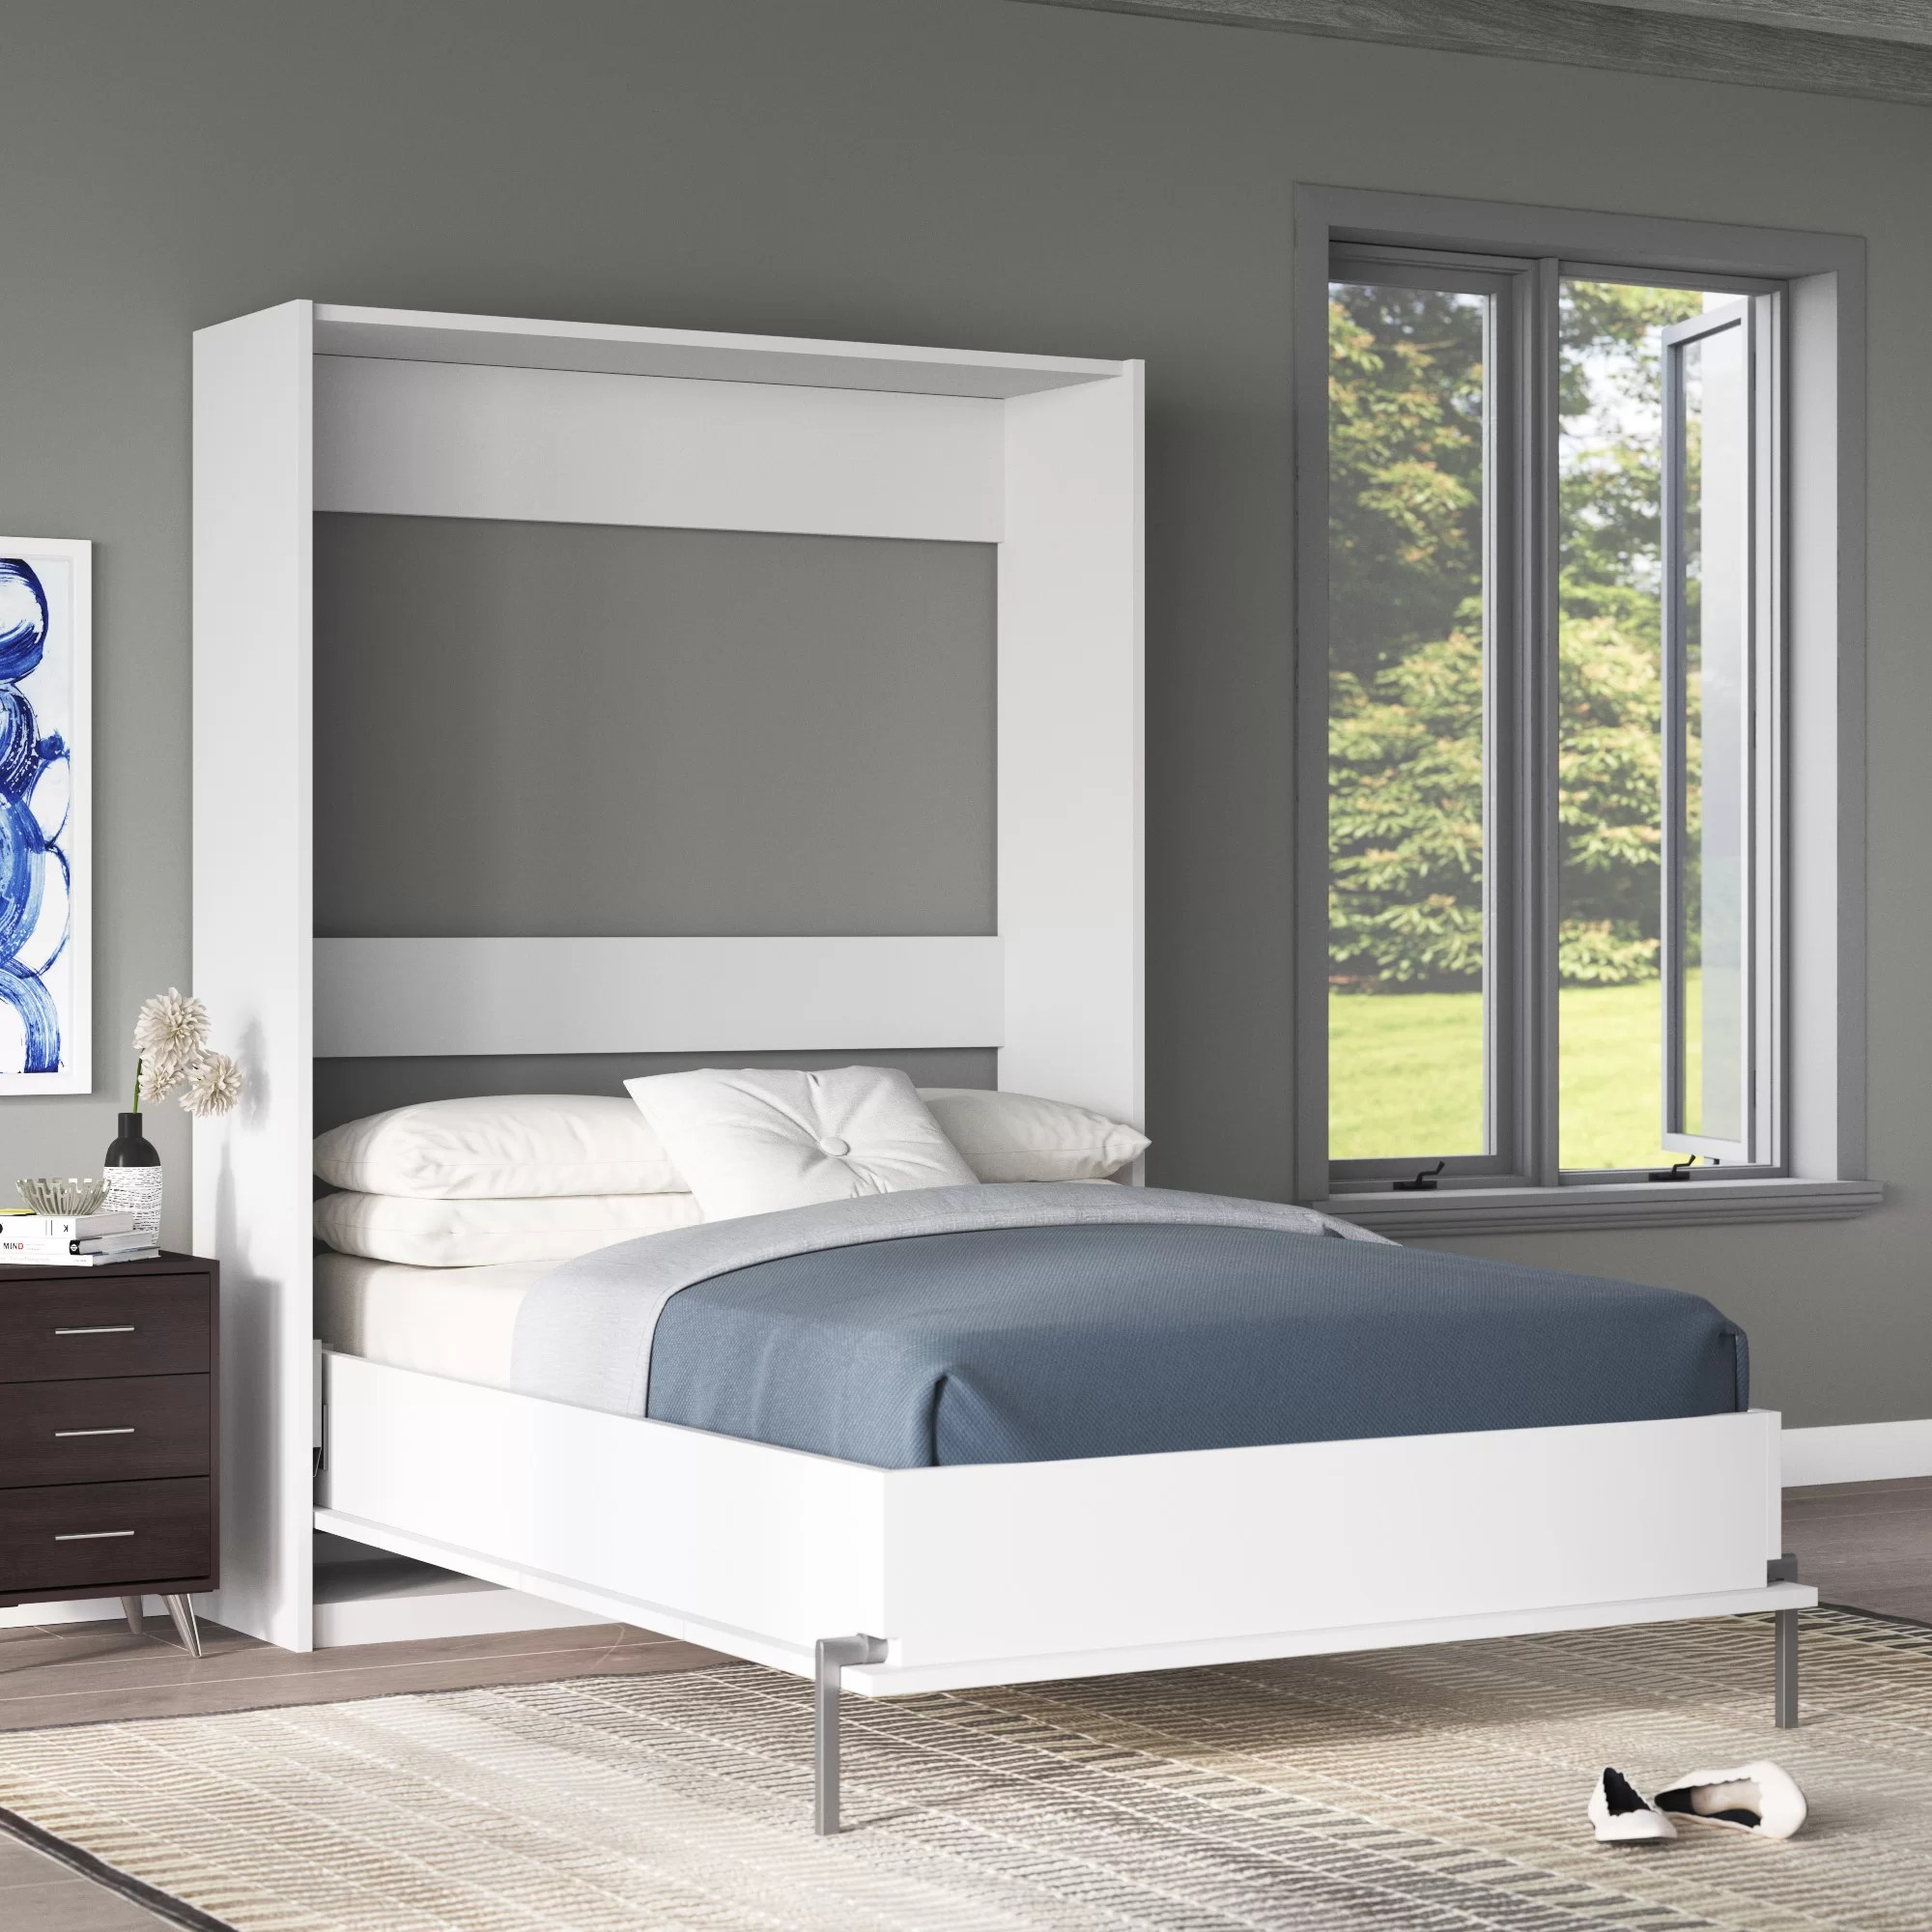 ojas full murphy bed